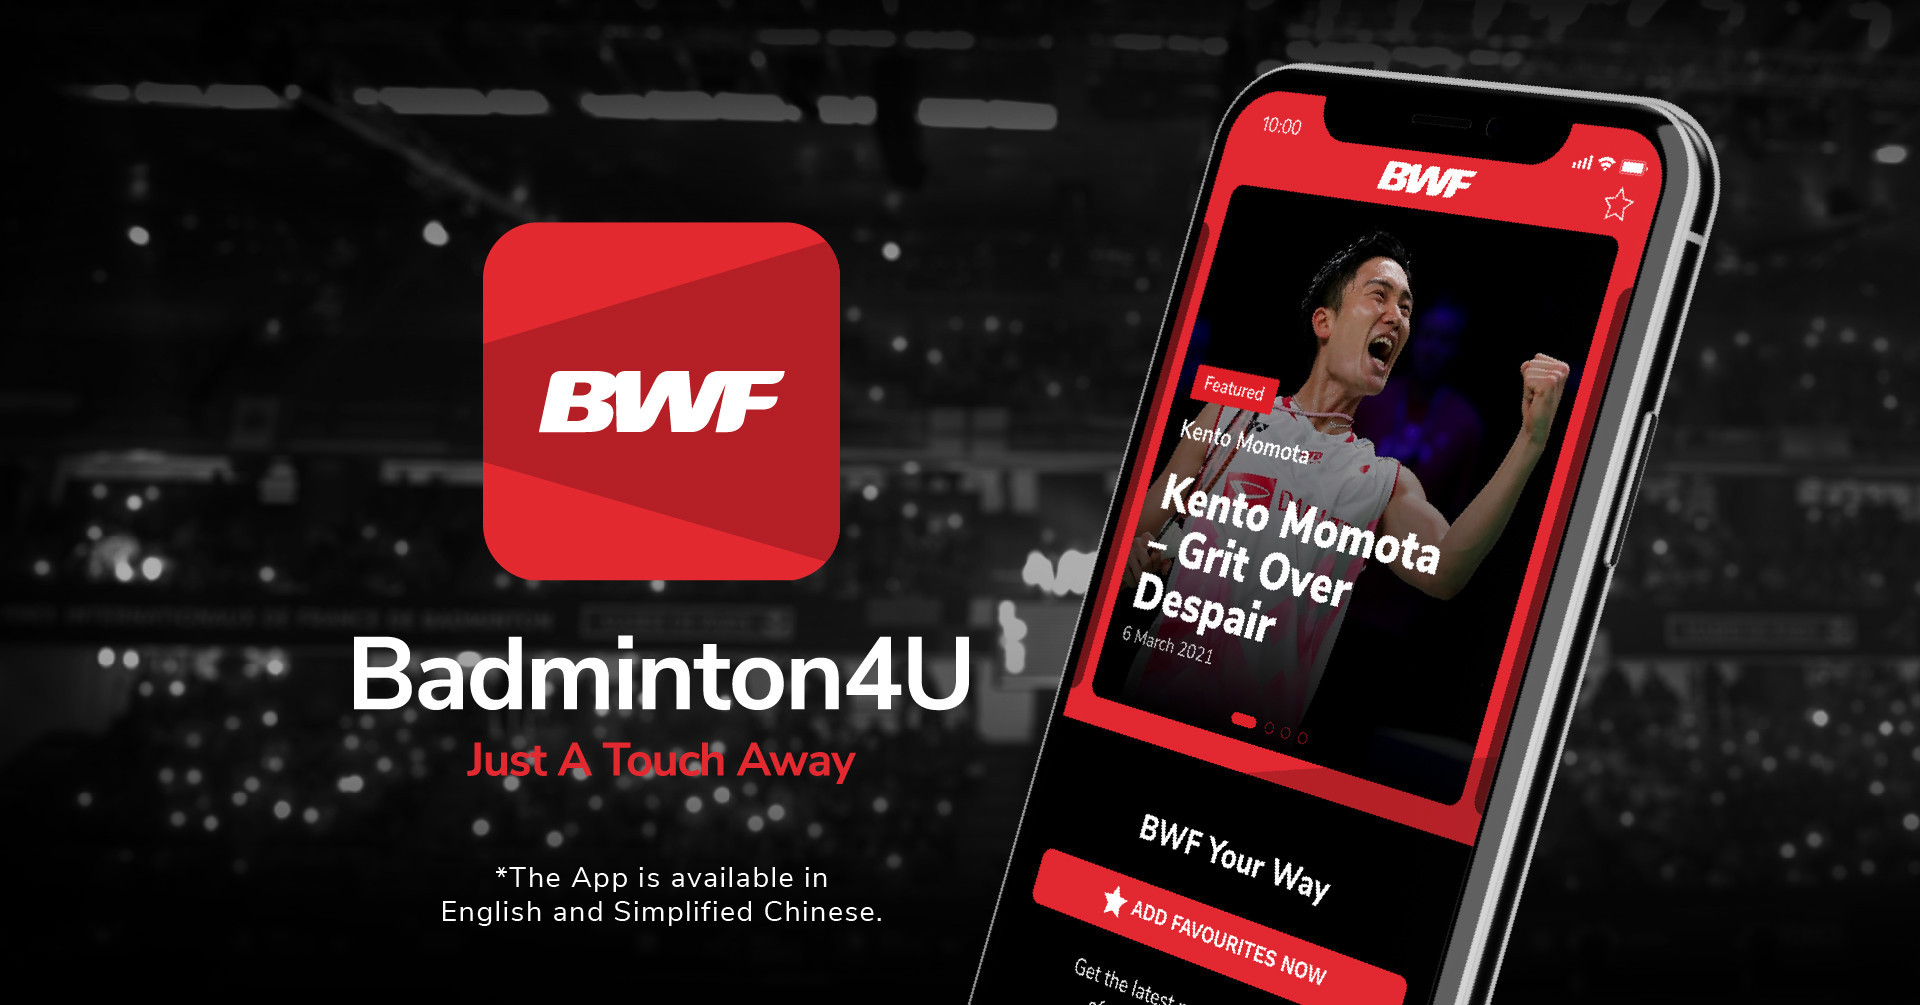 BWF to launch Badminton4U mobile app